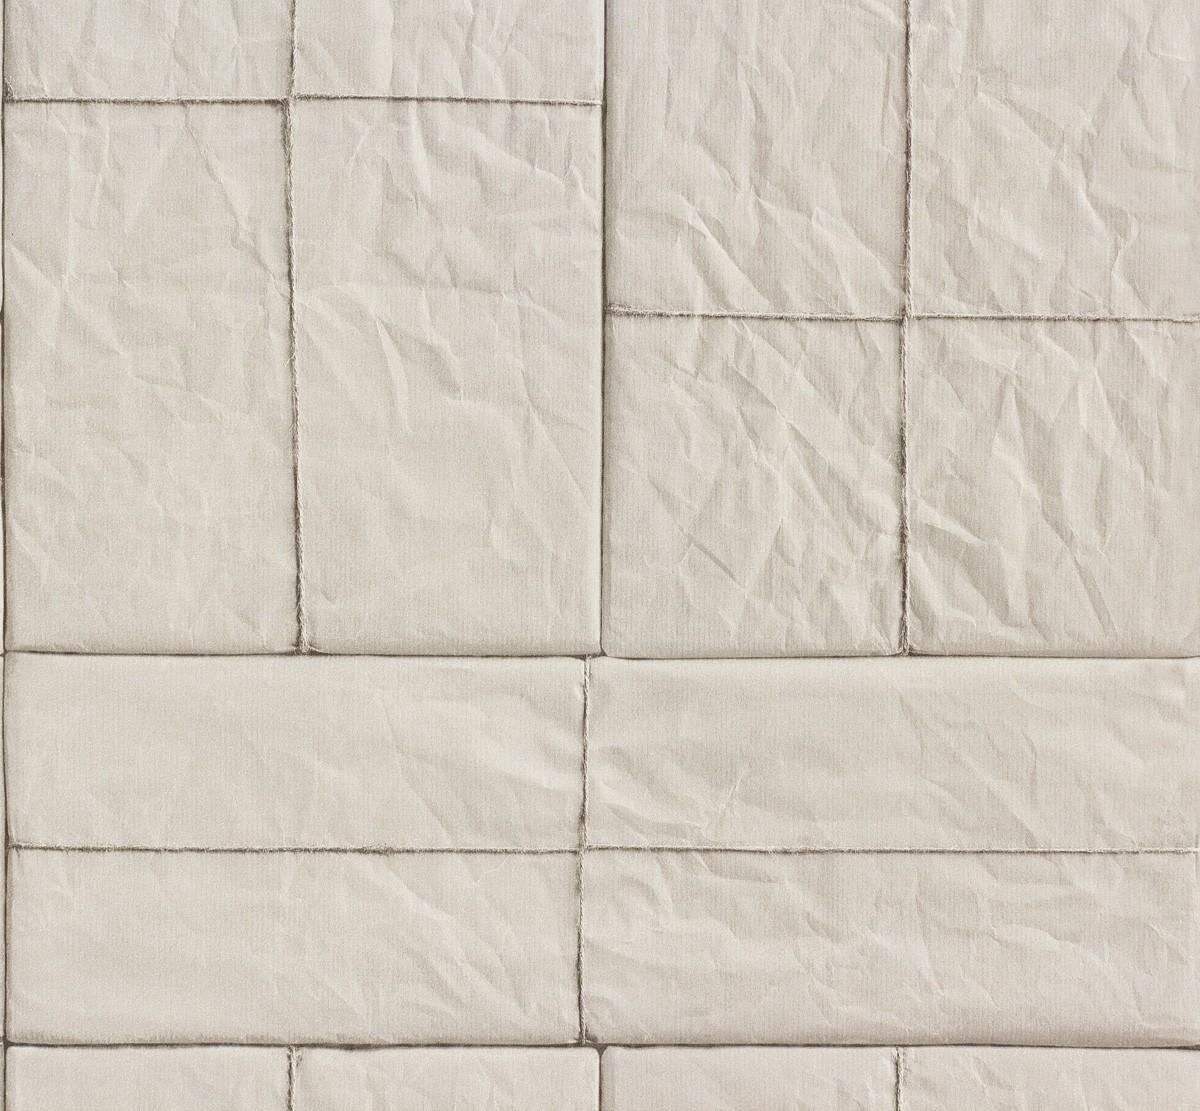 Rasch Tapete Crispy Paper Grau Fliesen Optik 524307 001